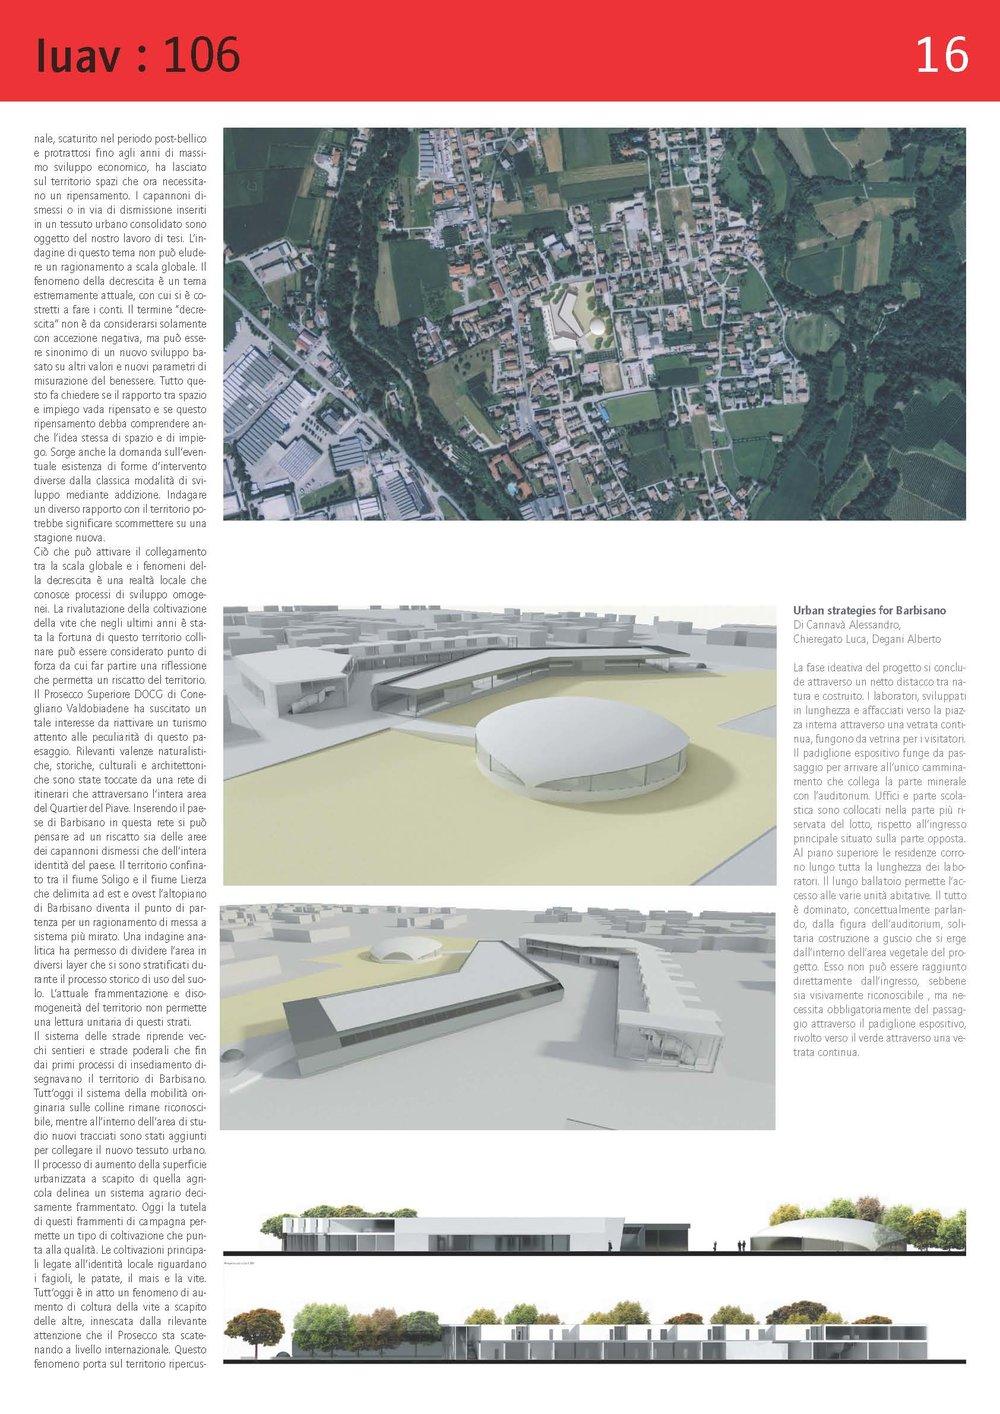 Copertine_Pagina_17.jpg